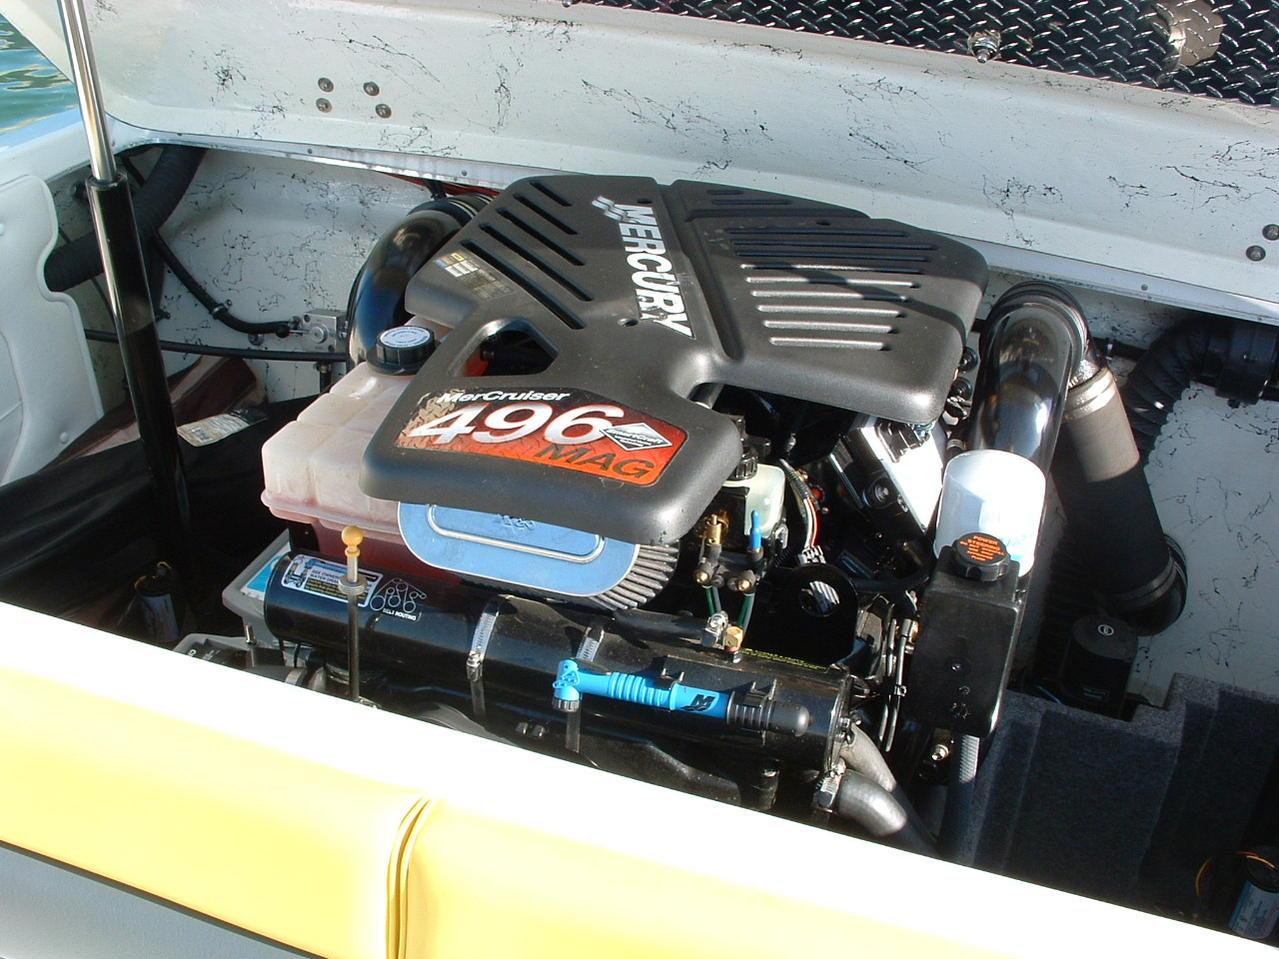 Click image for larger version.  Name:26 Daytona 059.jpg Views:421 Size:175.3 KB ID:68348